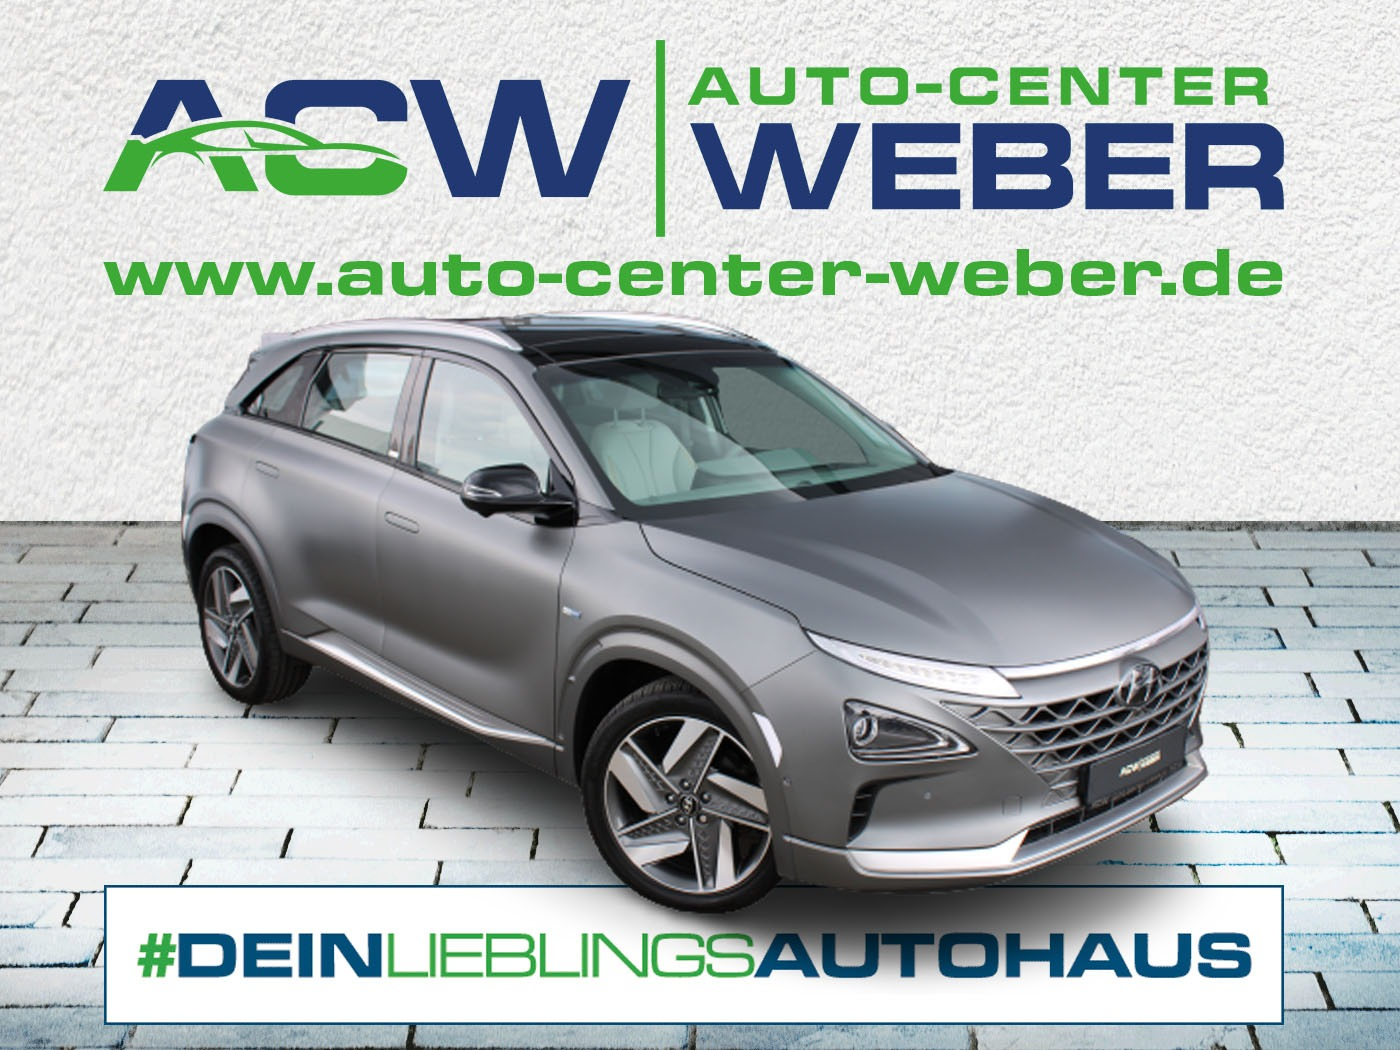 Hyundai Nexo Premium Automatik, Jahr 2020, hydrogenium